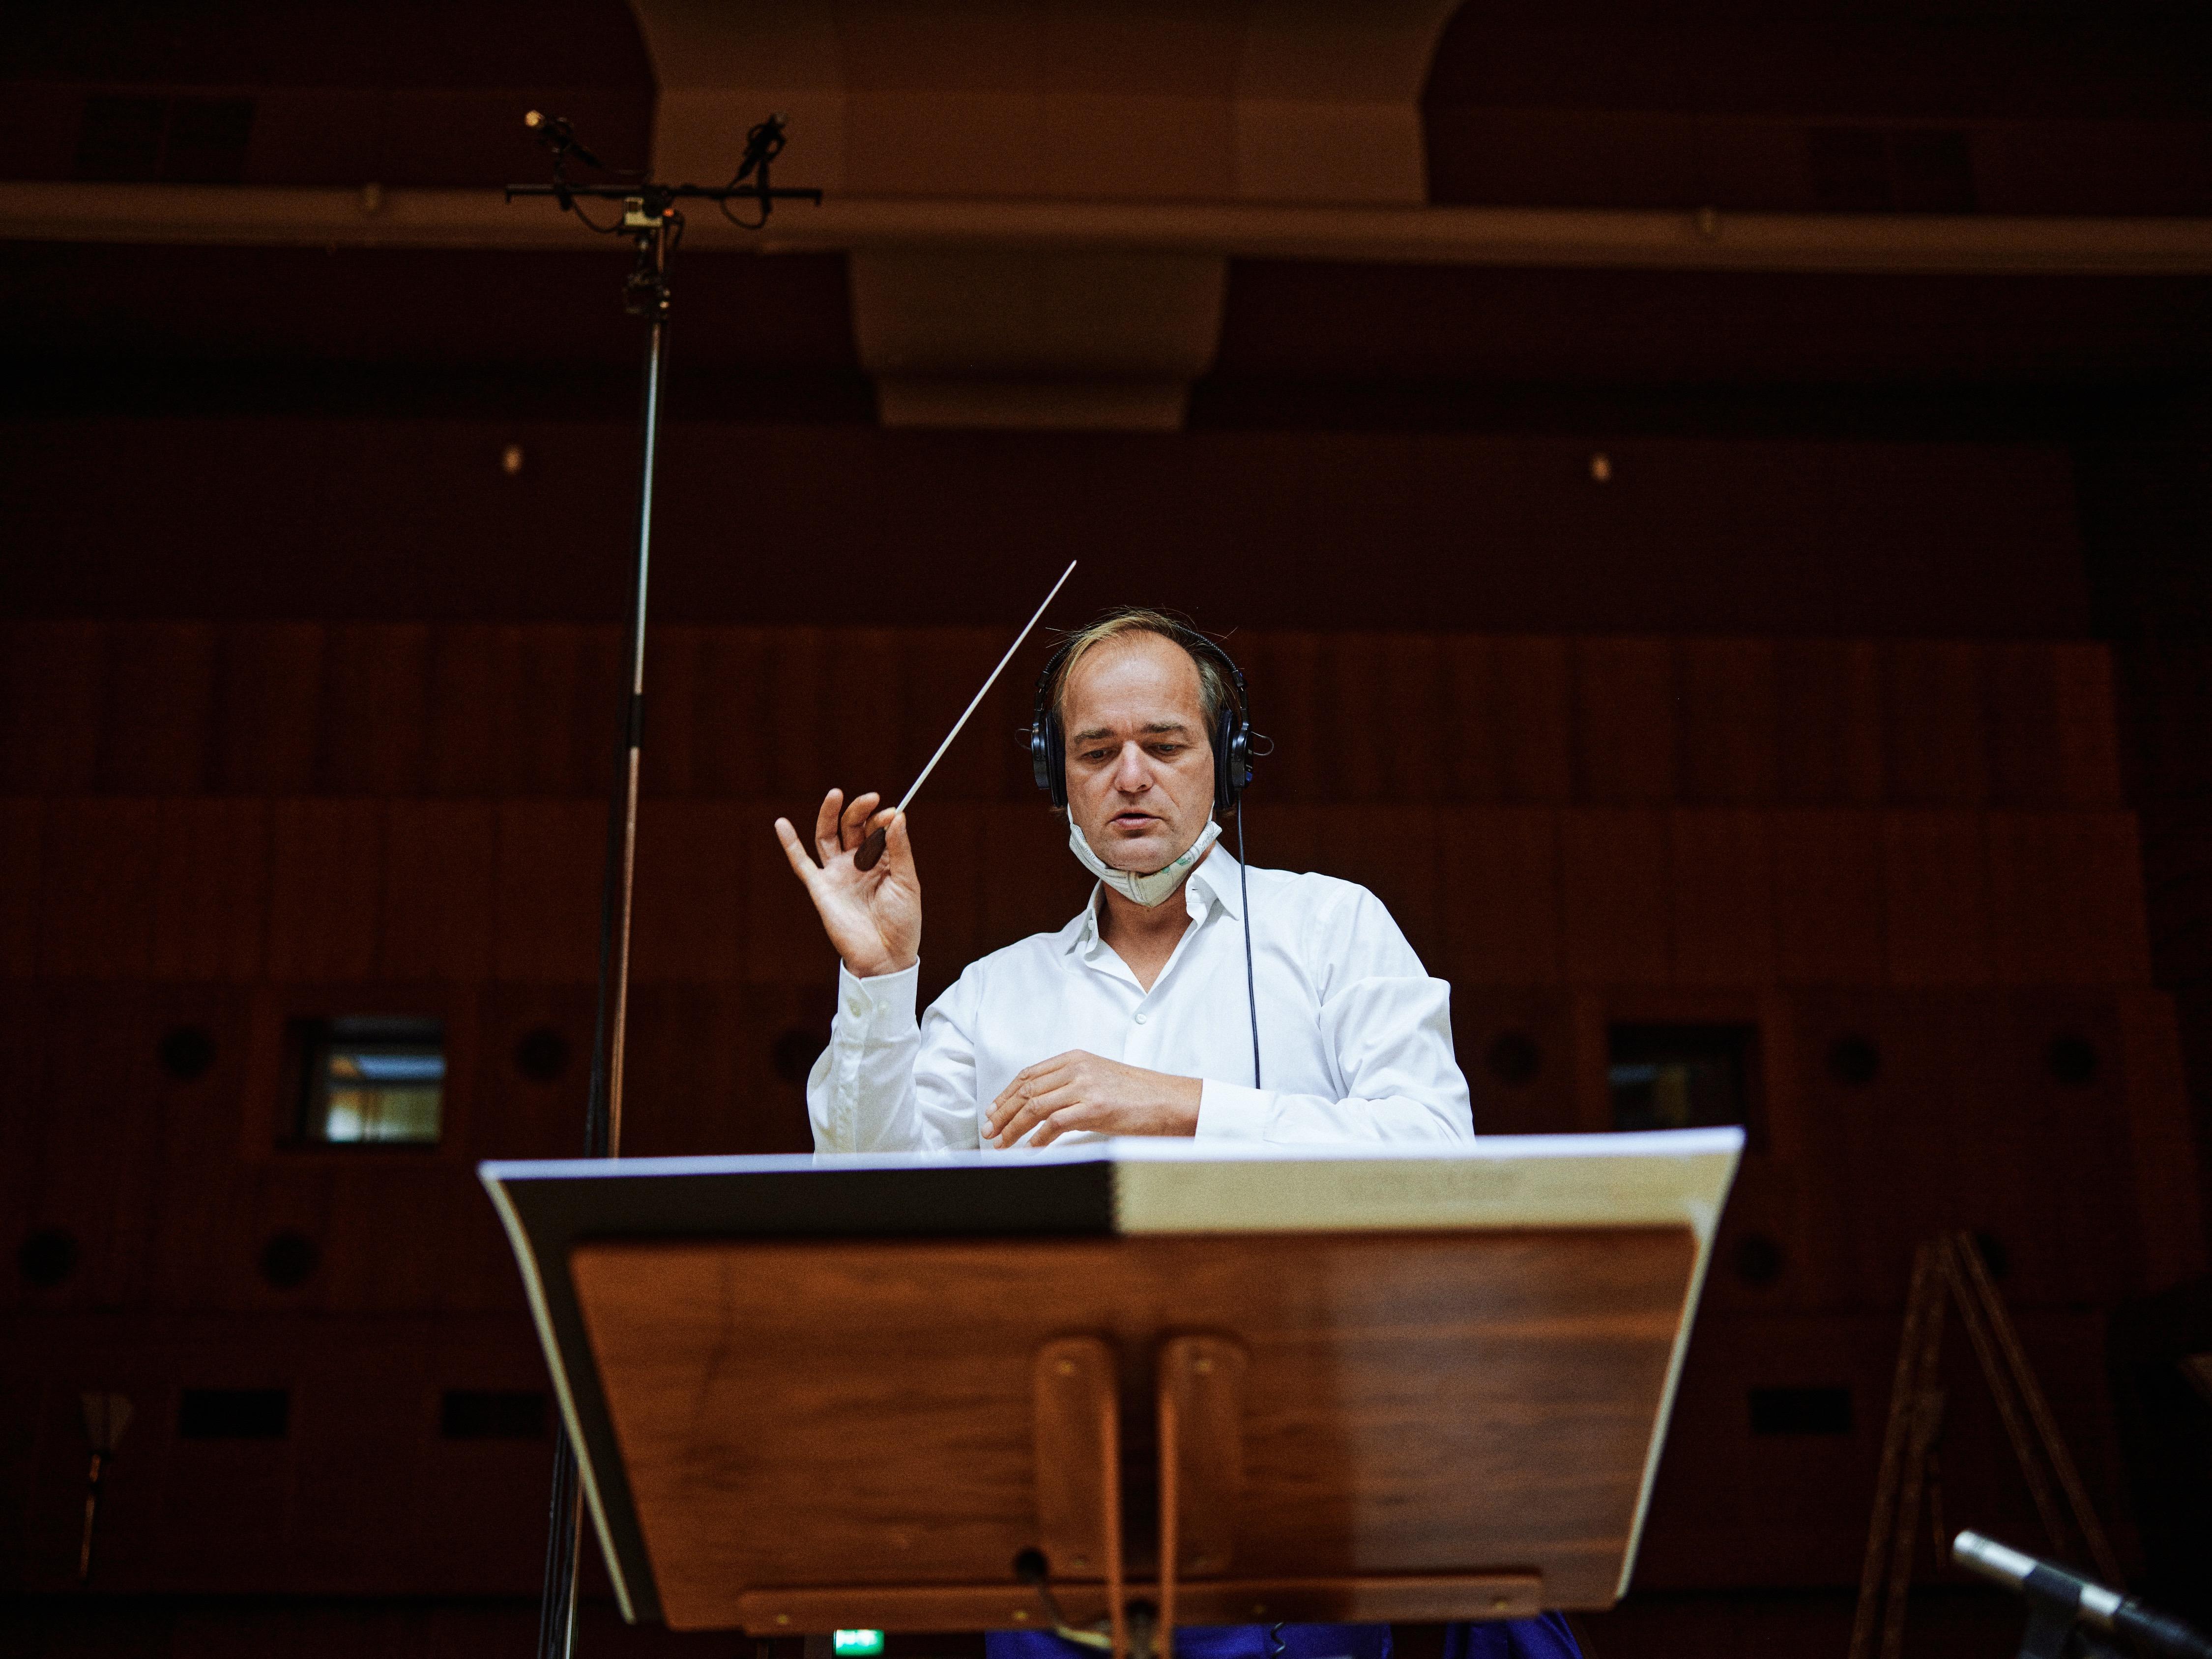 Orchester der Kulturen, Adrian Werum, Marc Schaefer, Hans-Rosaud-Studio, SWR